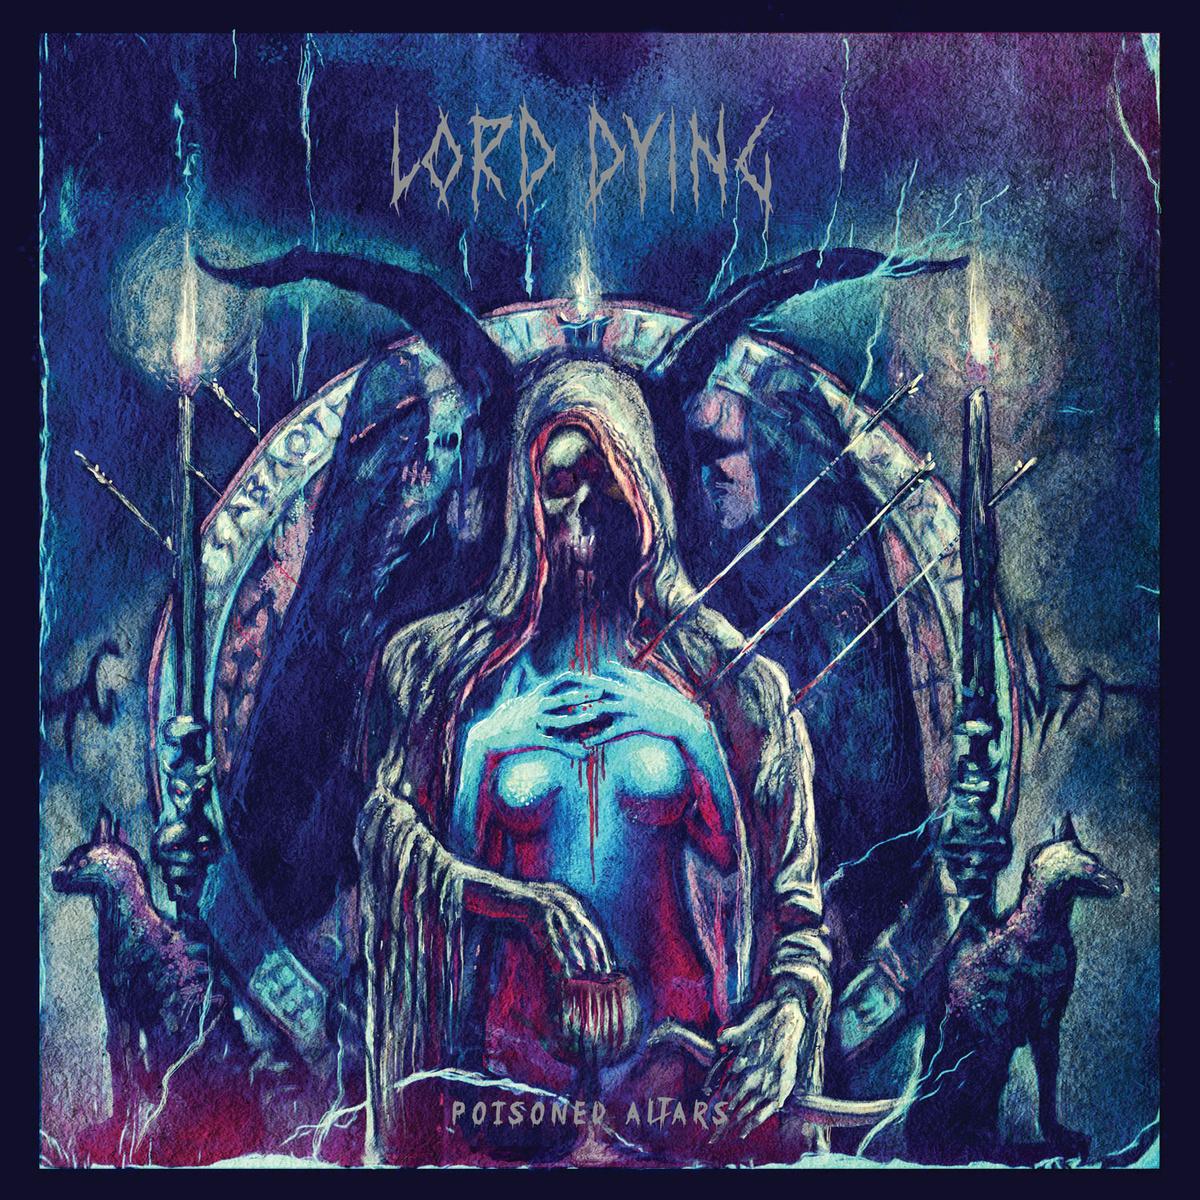 Alben der Woche 23.01.15 - Lord Dying POISONED ALTARS